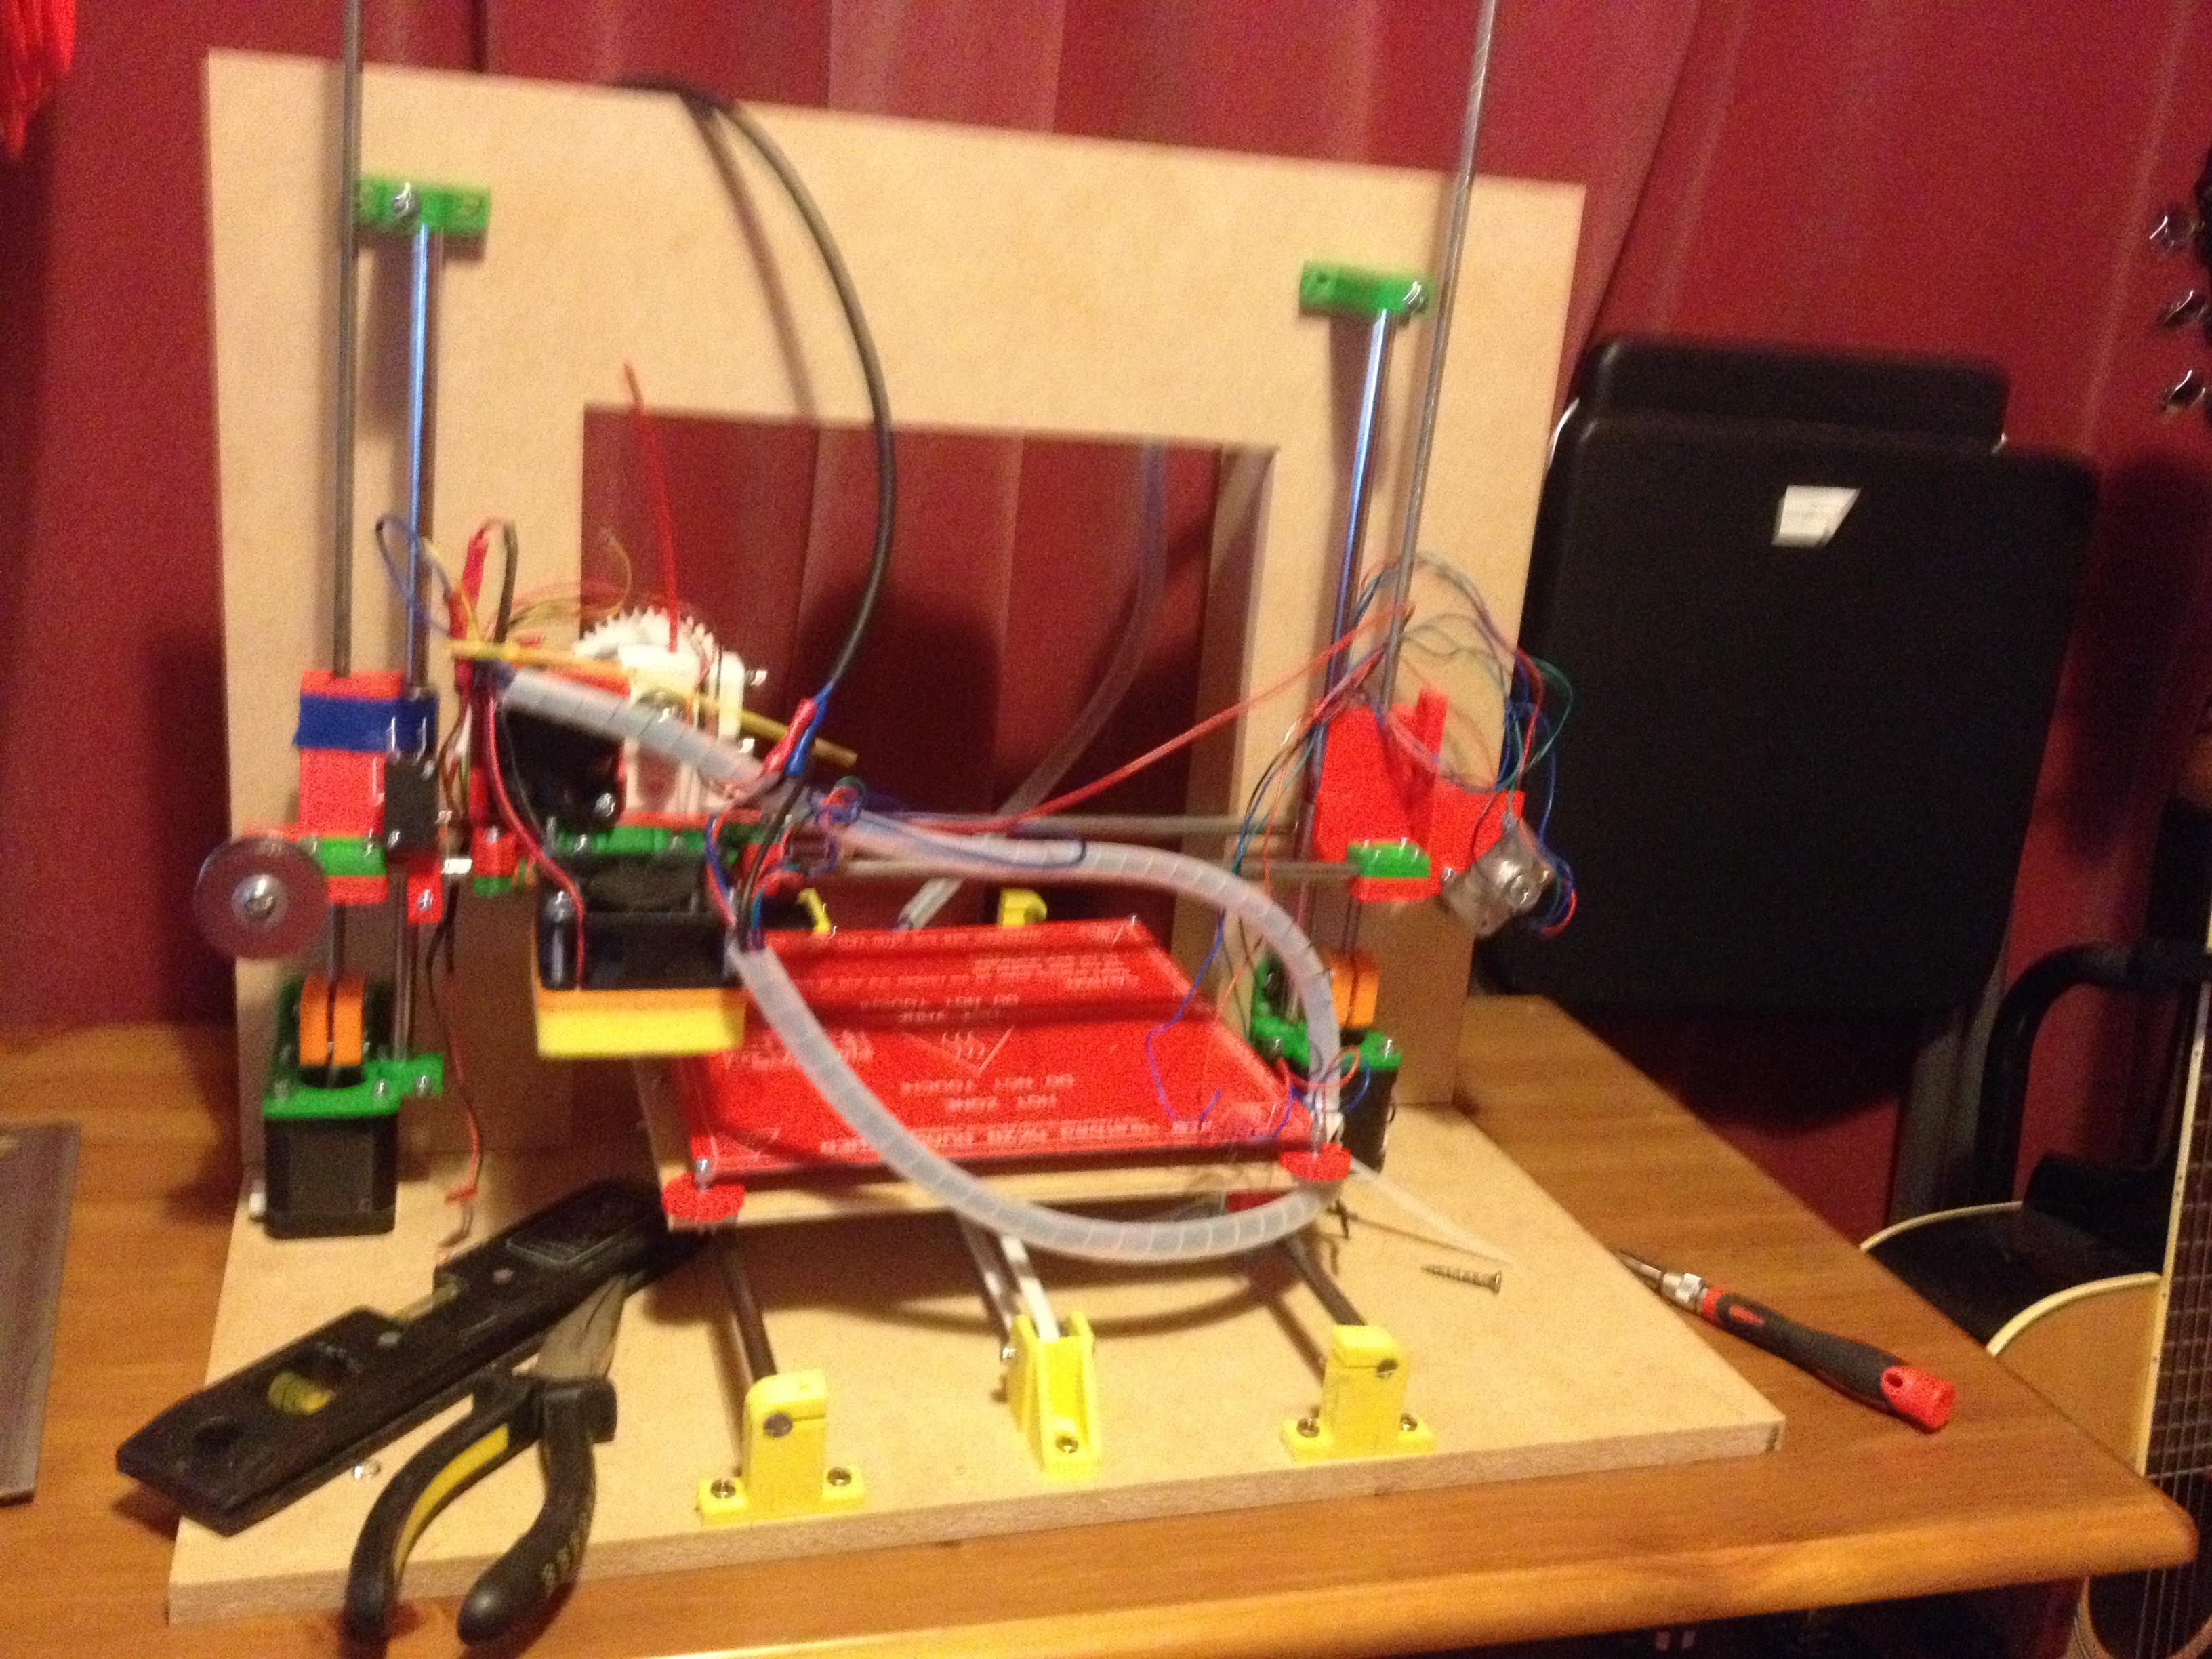 My home built 3D printer